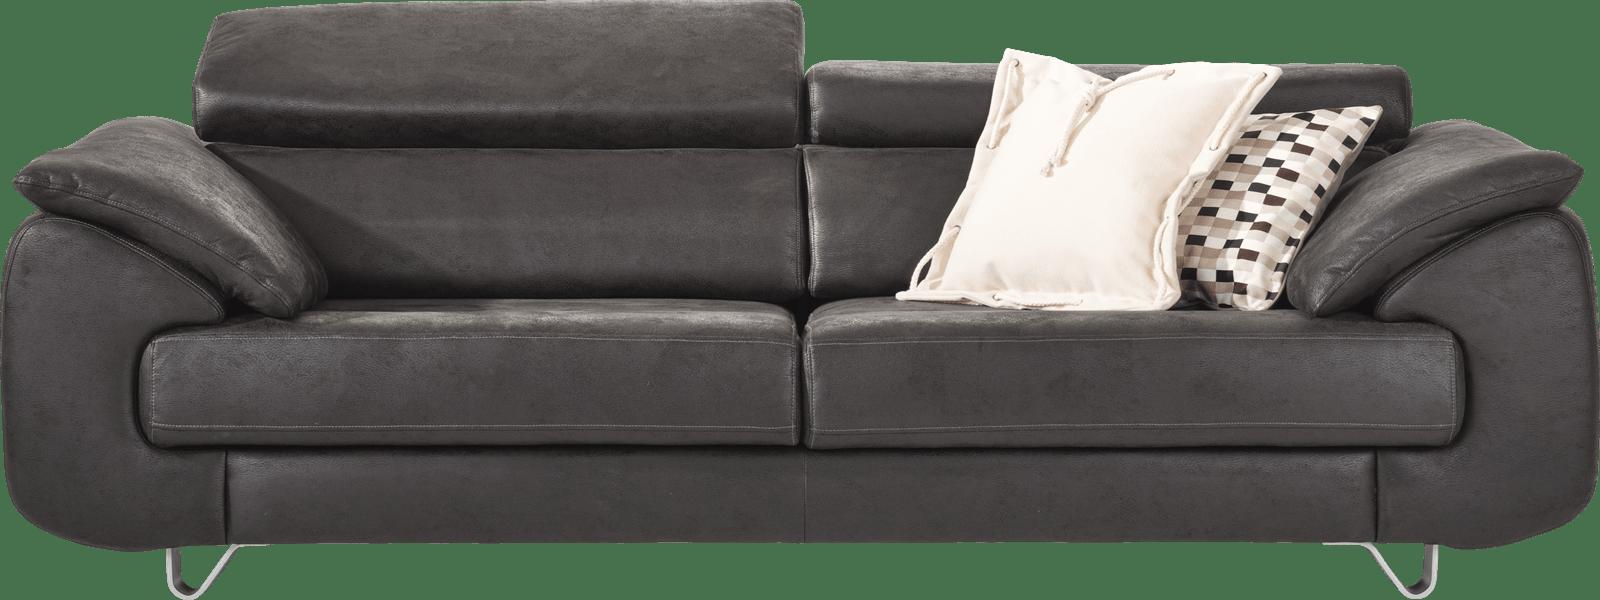 Henders & Hazel - Havanna - Modern - Sofas - 3-sitzer sitz fest